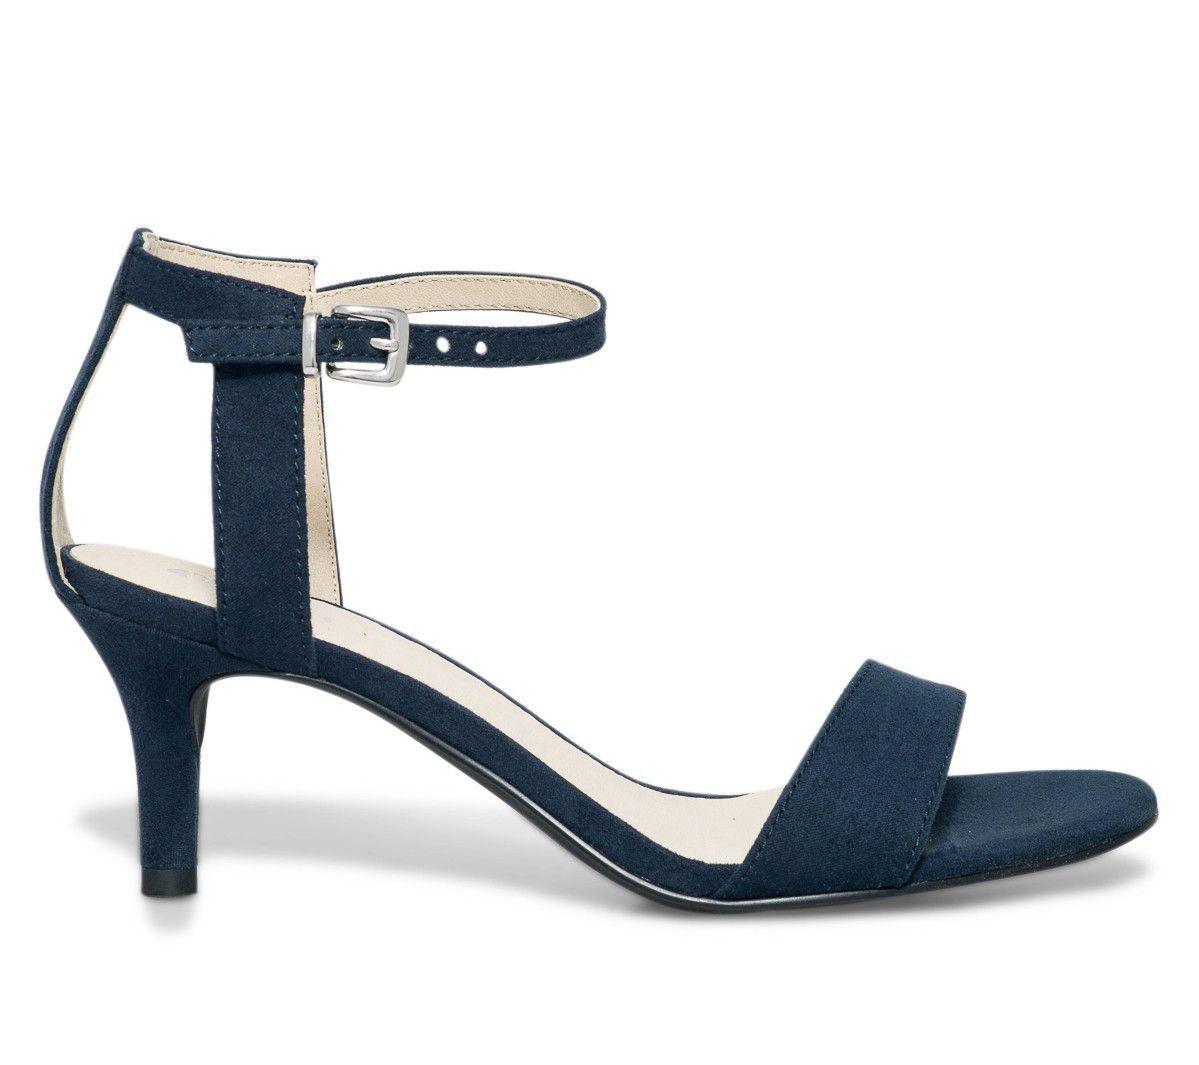 sandale petit talon marine - Sandales talon - Chaussures femme ... f3caf048206f